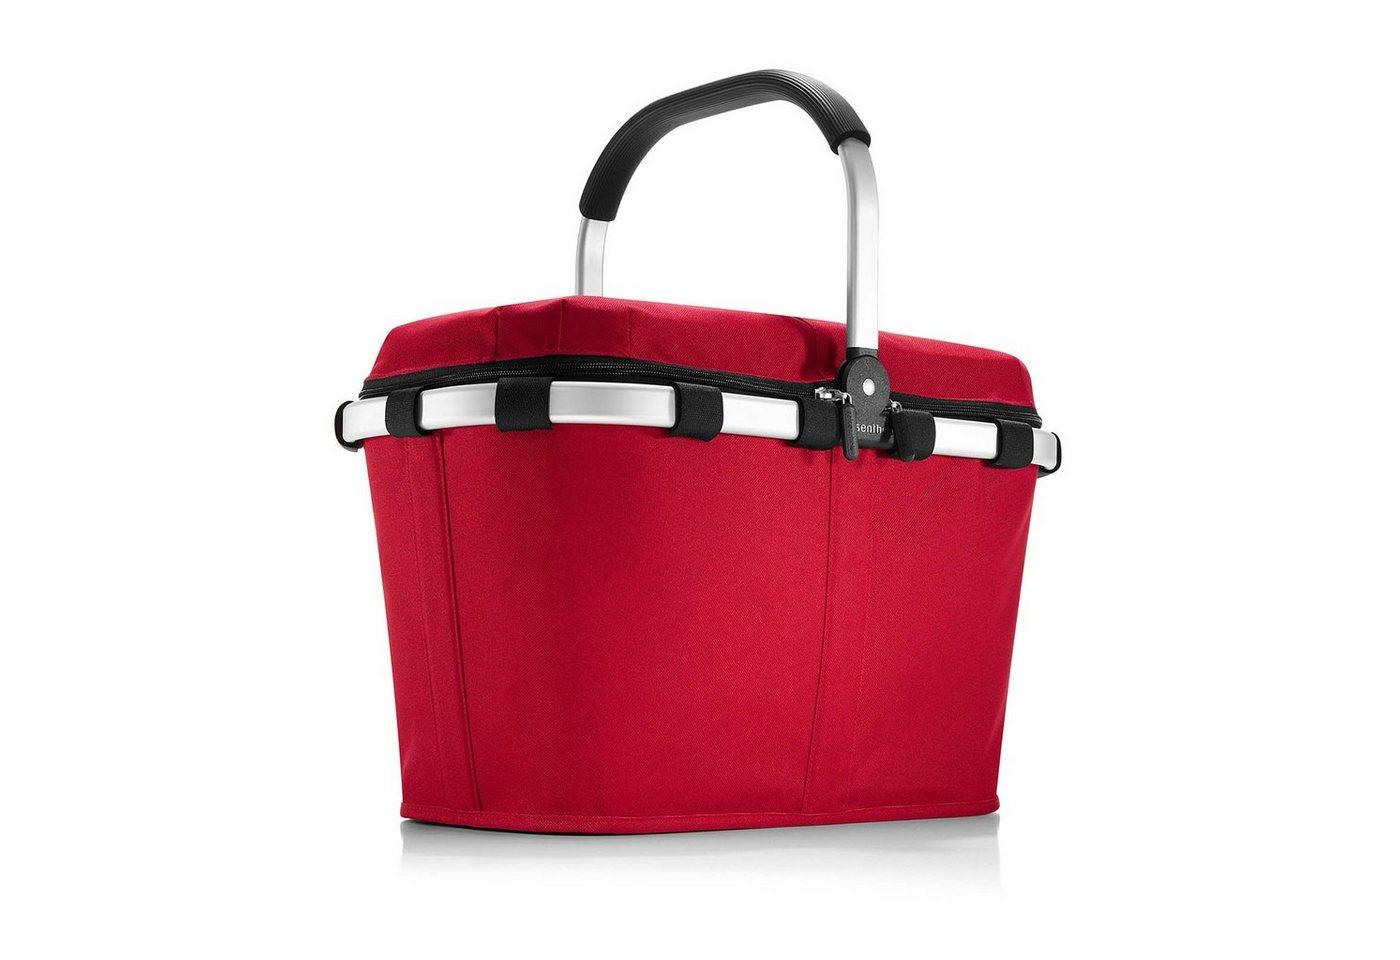 REISENTHEL® Einkaufskorb isoliert »carrybag iso« | Taschen > Handtaschen > Einkaufstasche | REISENTHEL®